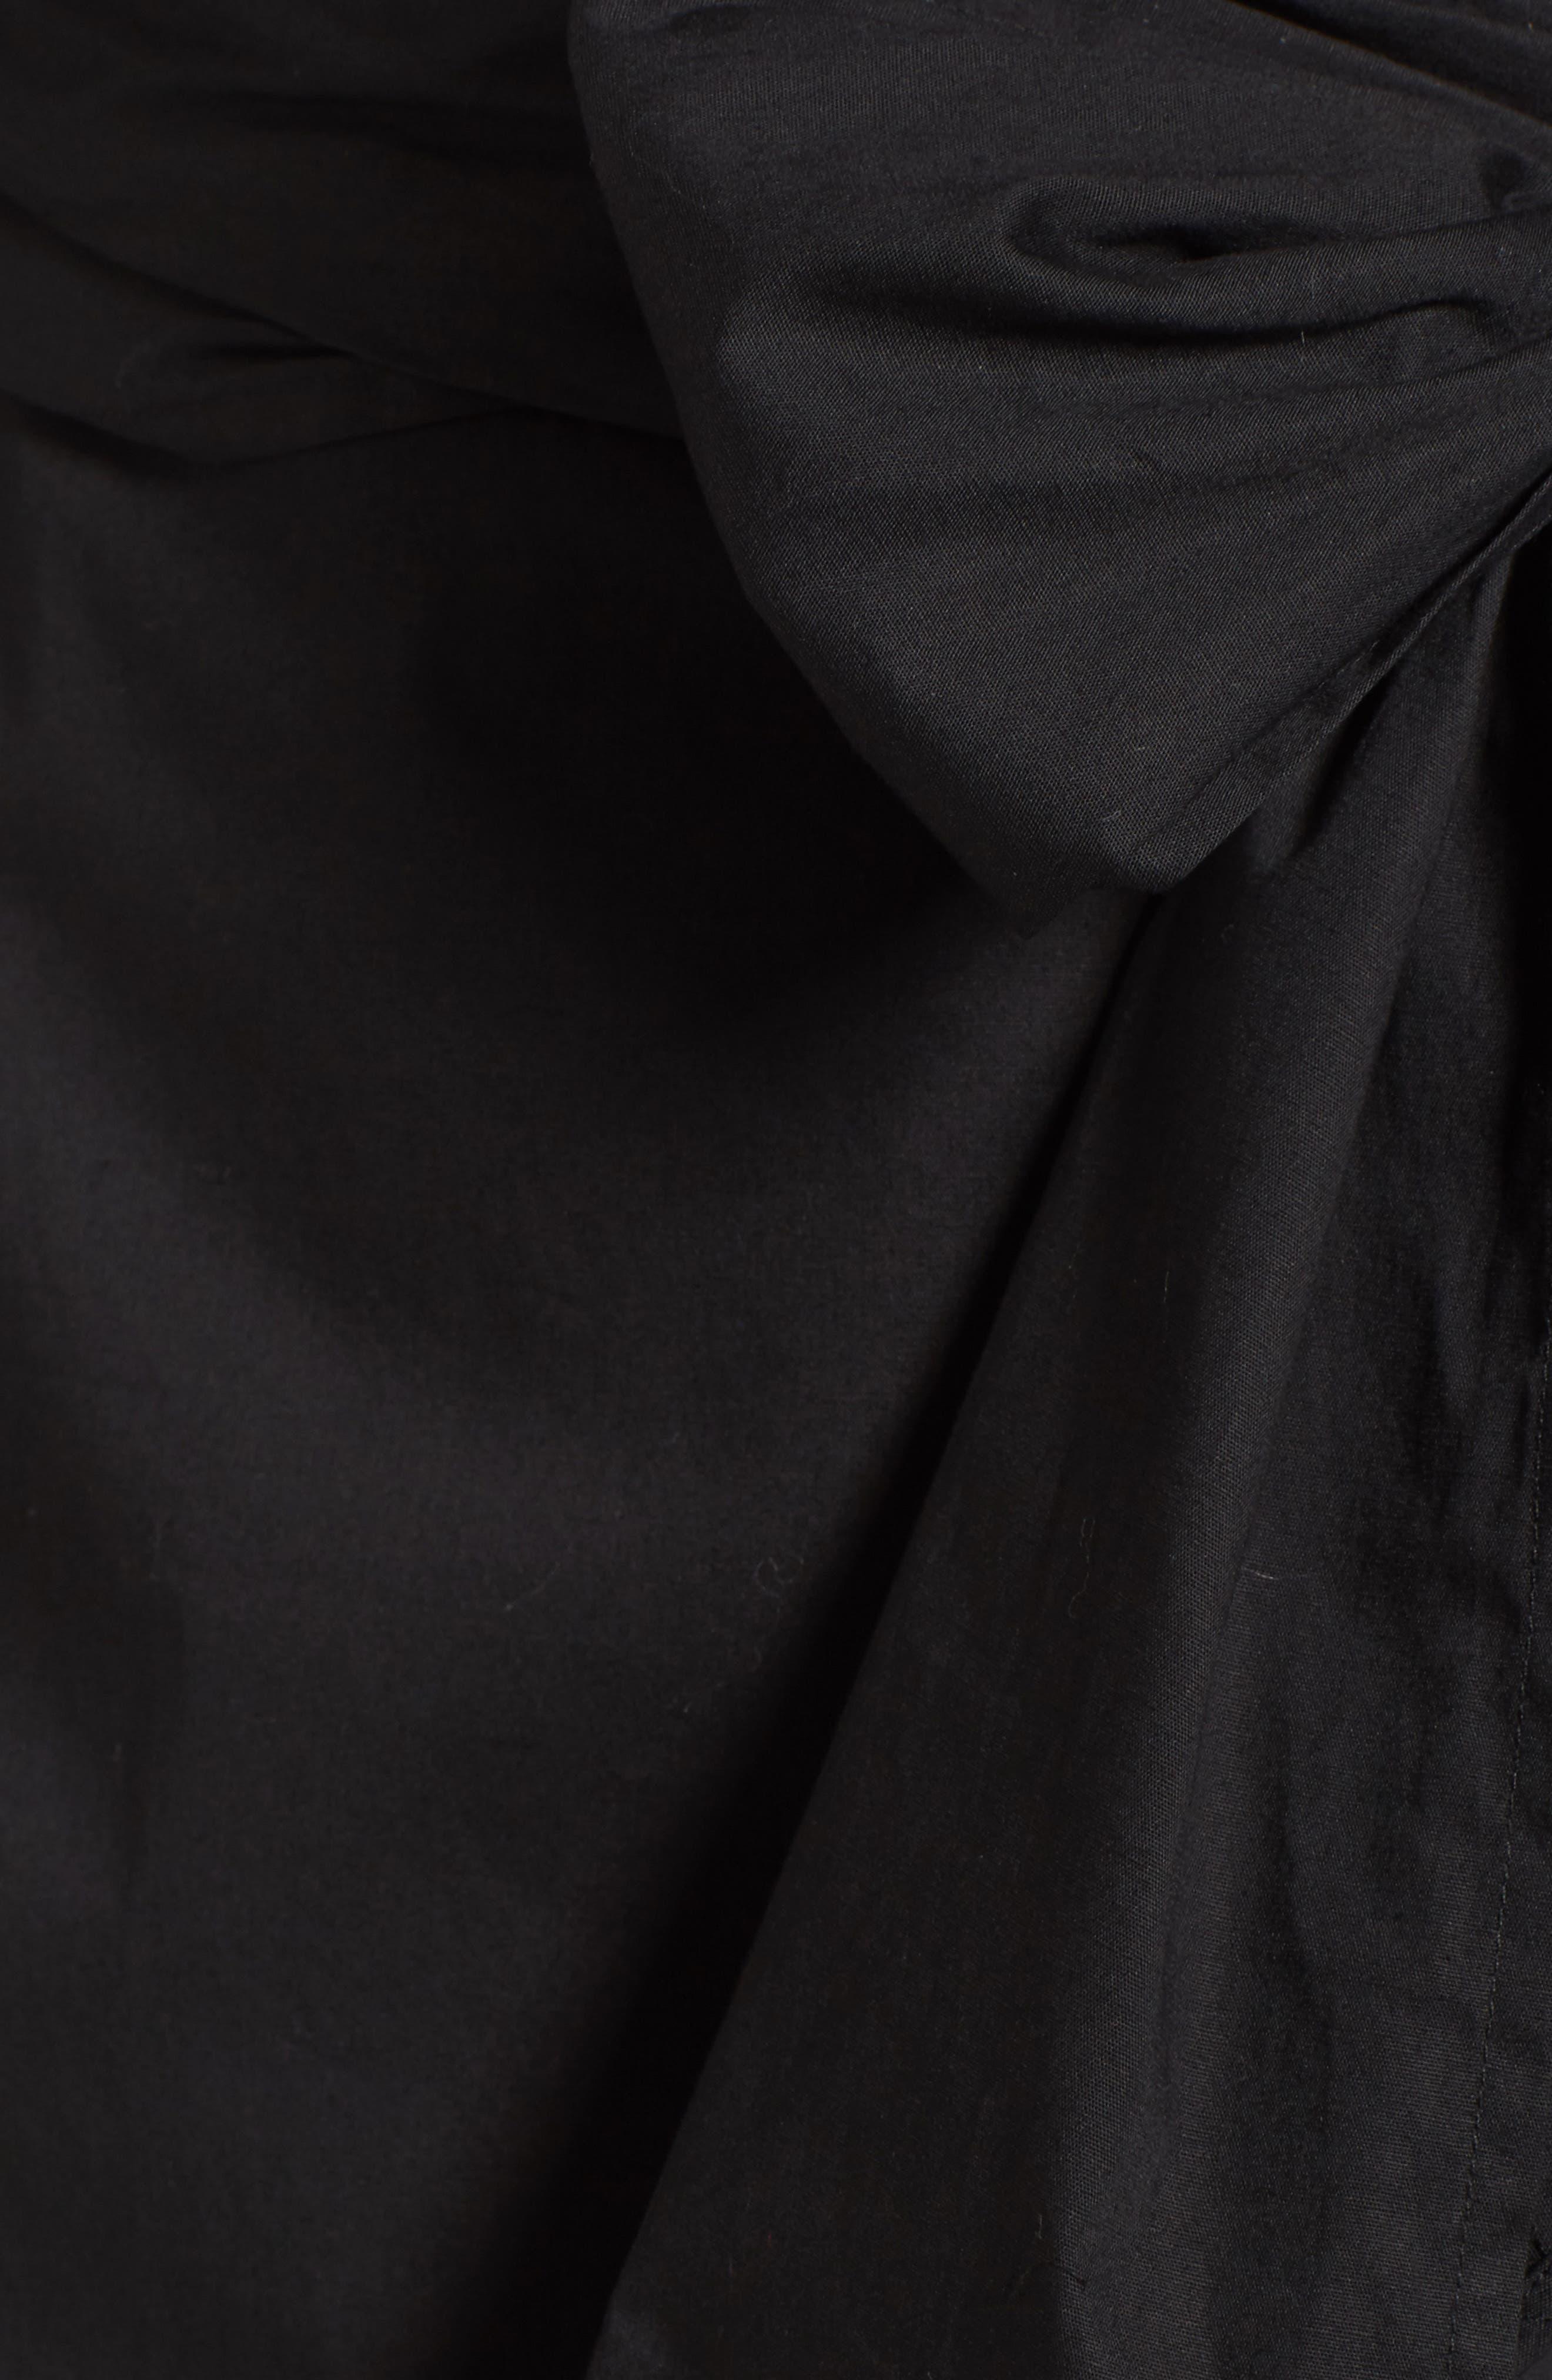 Wrap Bell Sleeve Dress,                             Alternate thumbnail 5, color,                             001